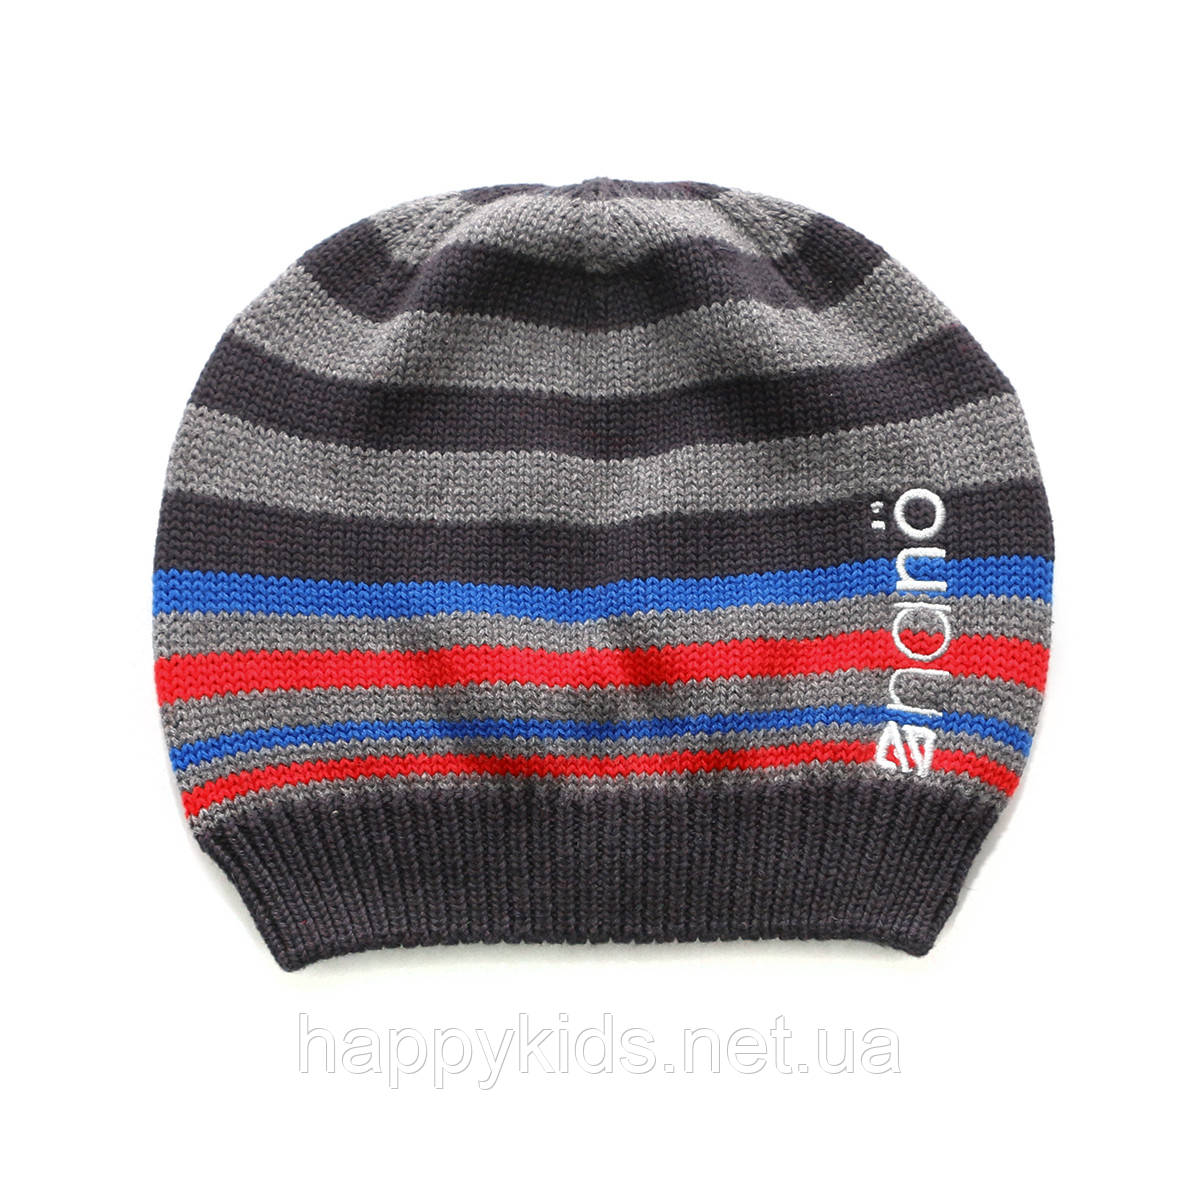 Демисезонная шапка  для мальчика  NANO 271 TUT S17 Chili.  Р-р  12/24 мес - 7/12.